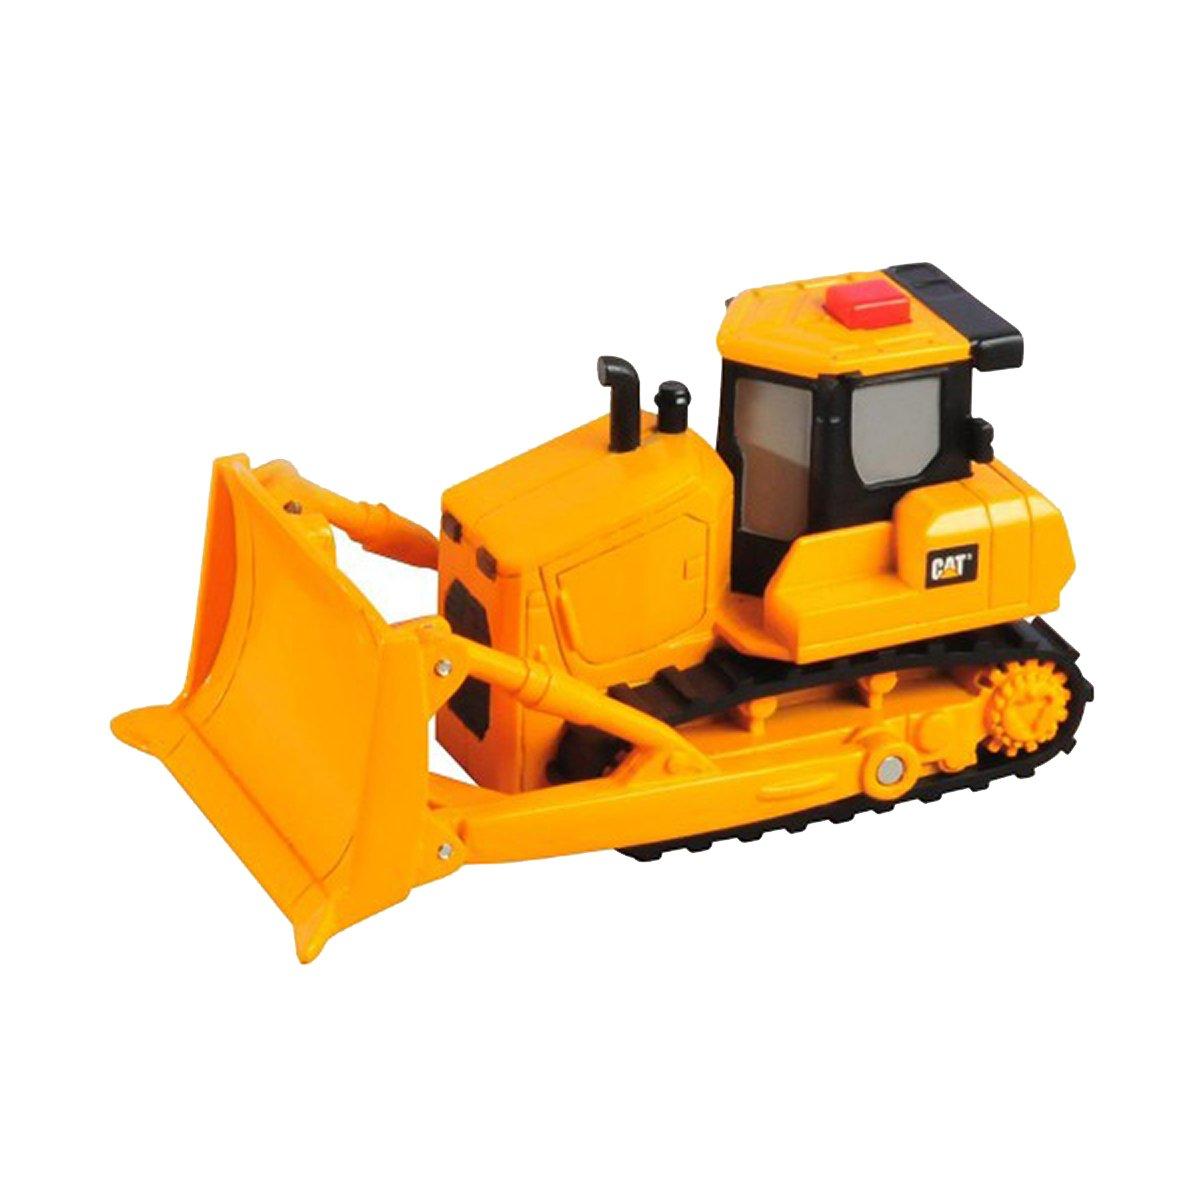 buldozer toy state cat flash rides